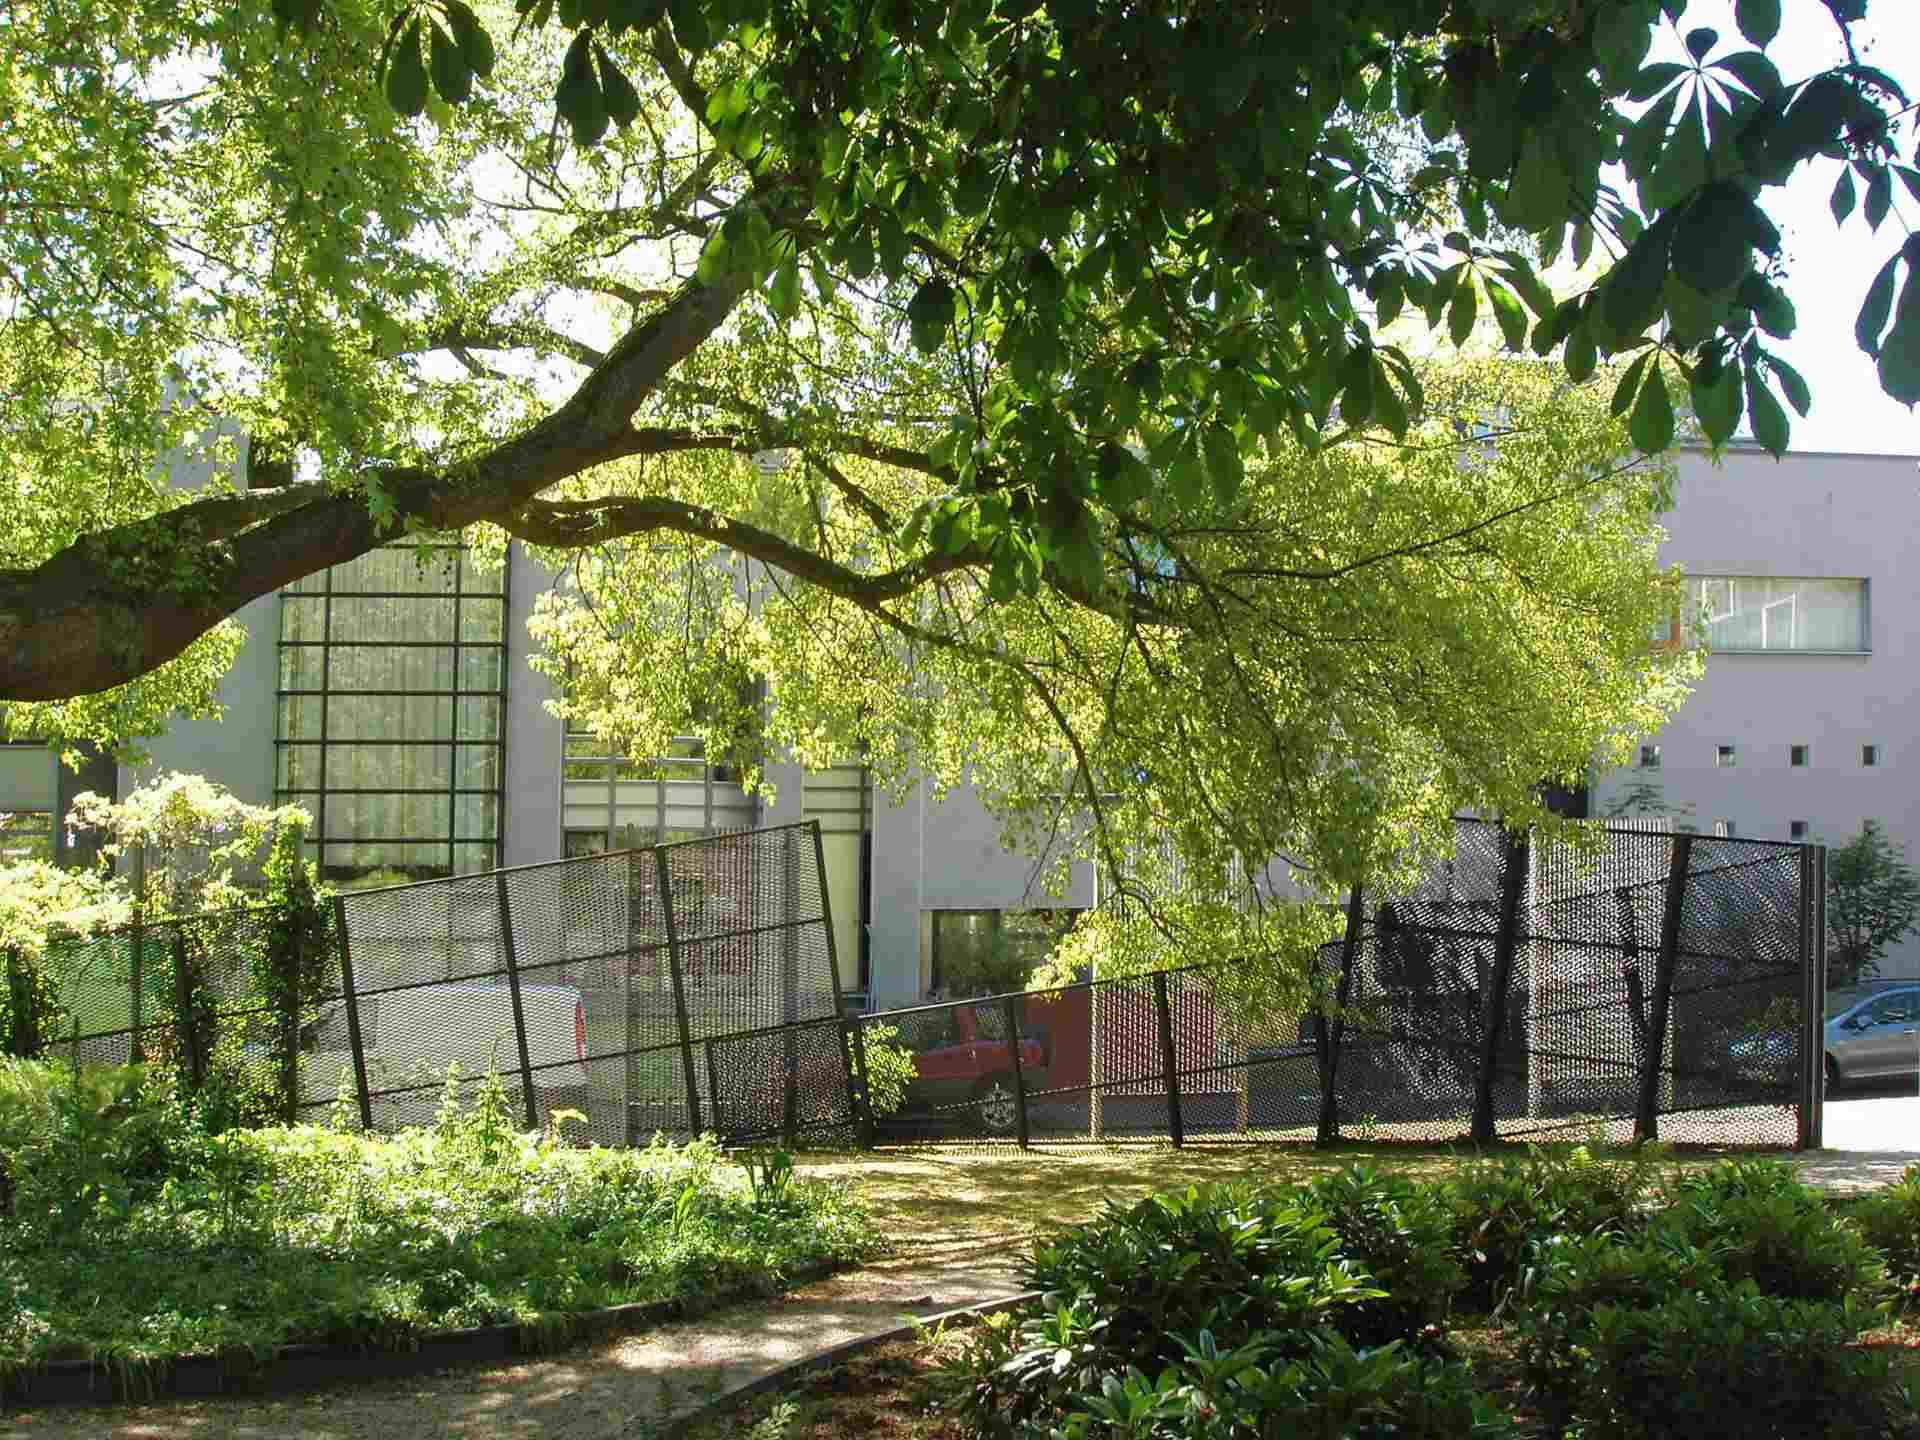 Layered fencing Doelenpark, Delft 1996